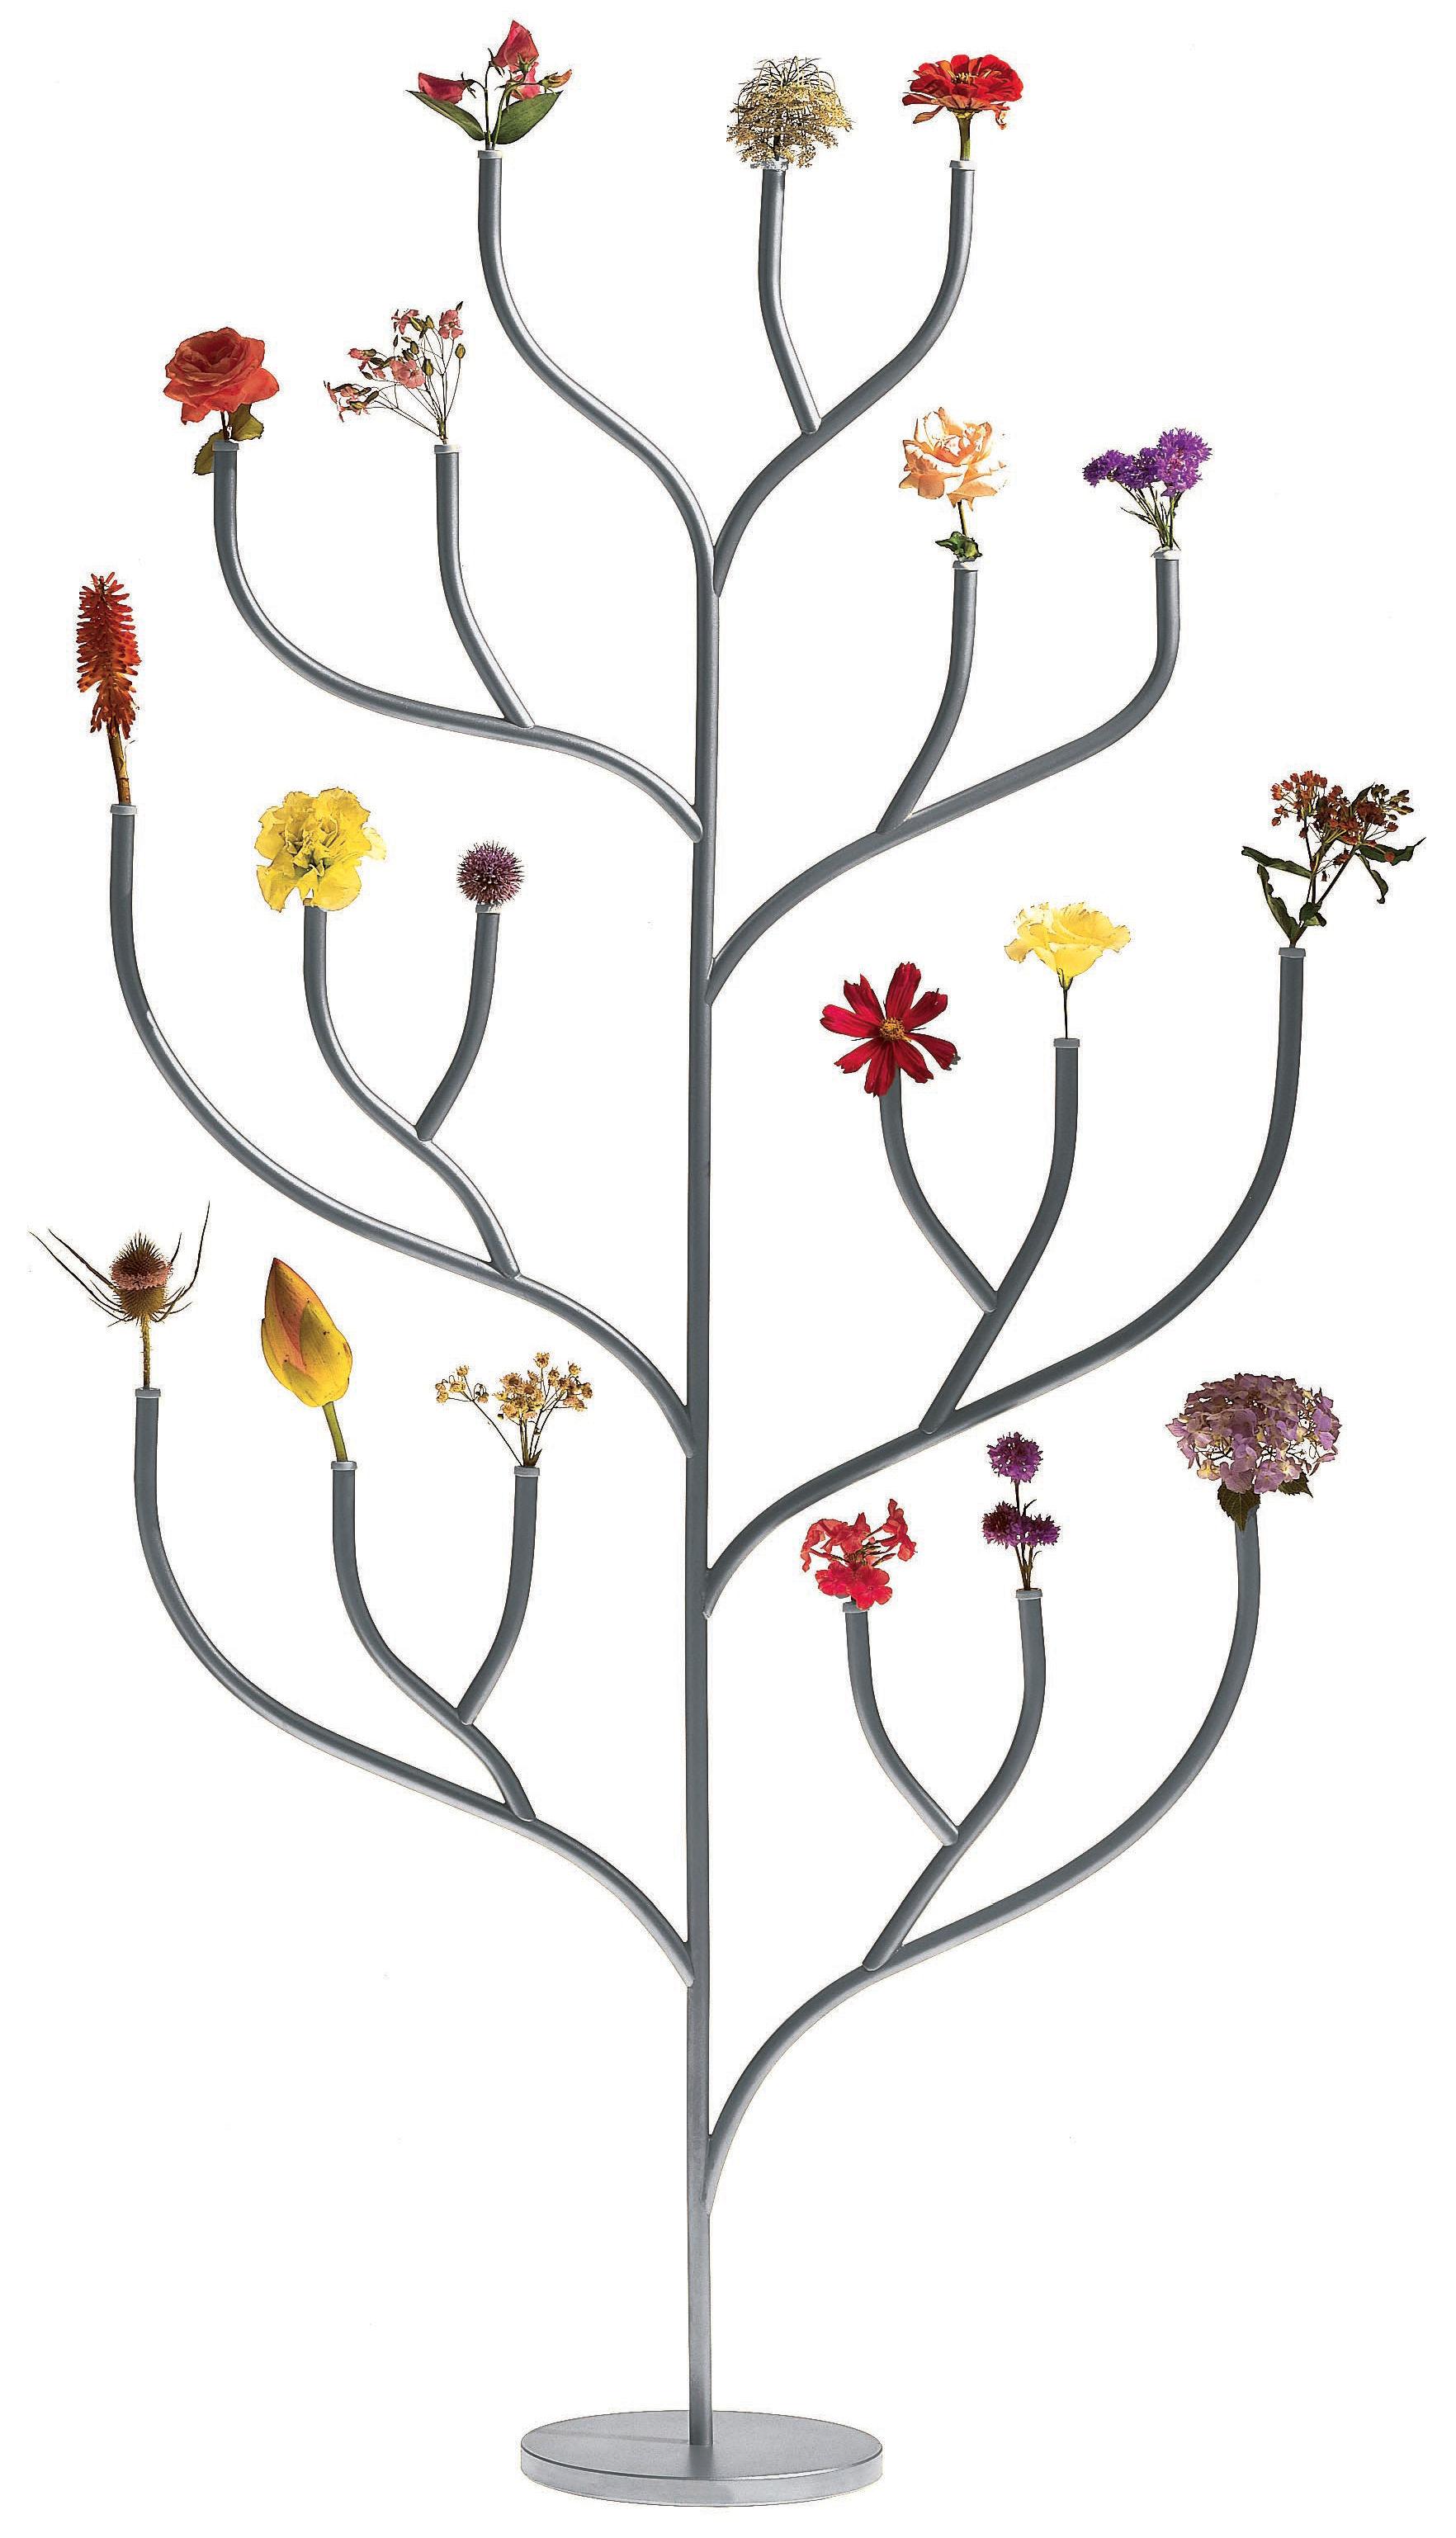 Outdoor - Vasi e Piante - Fioriera Hanahana di Driade - Acciaio inox - Acciaio lucidato